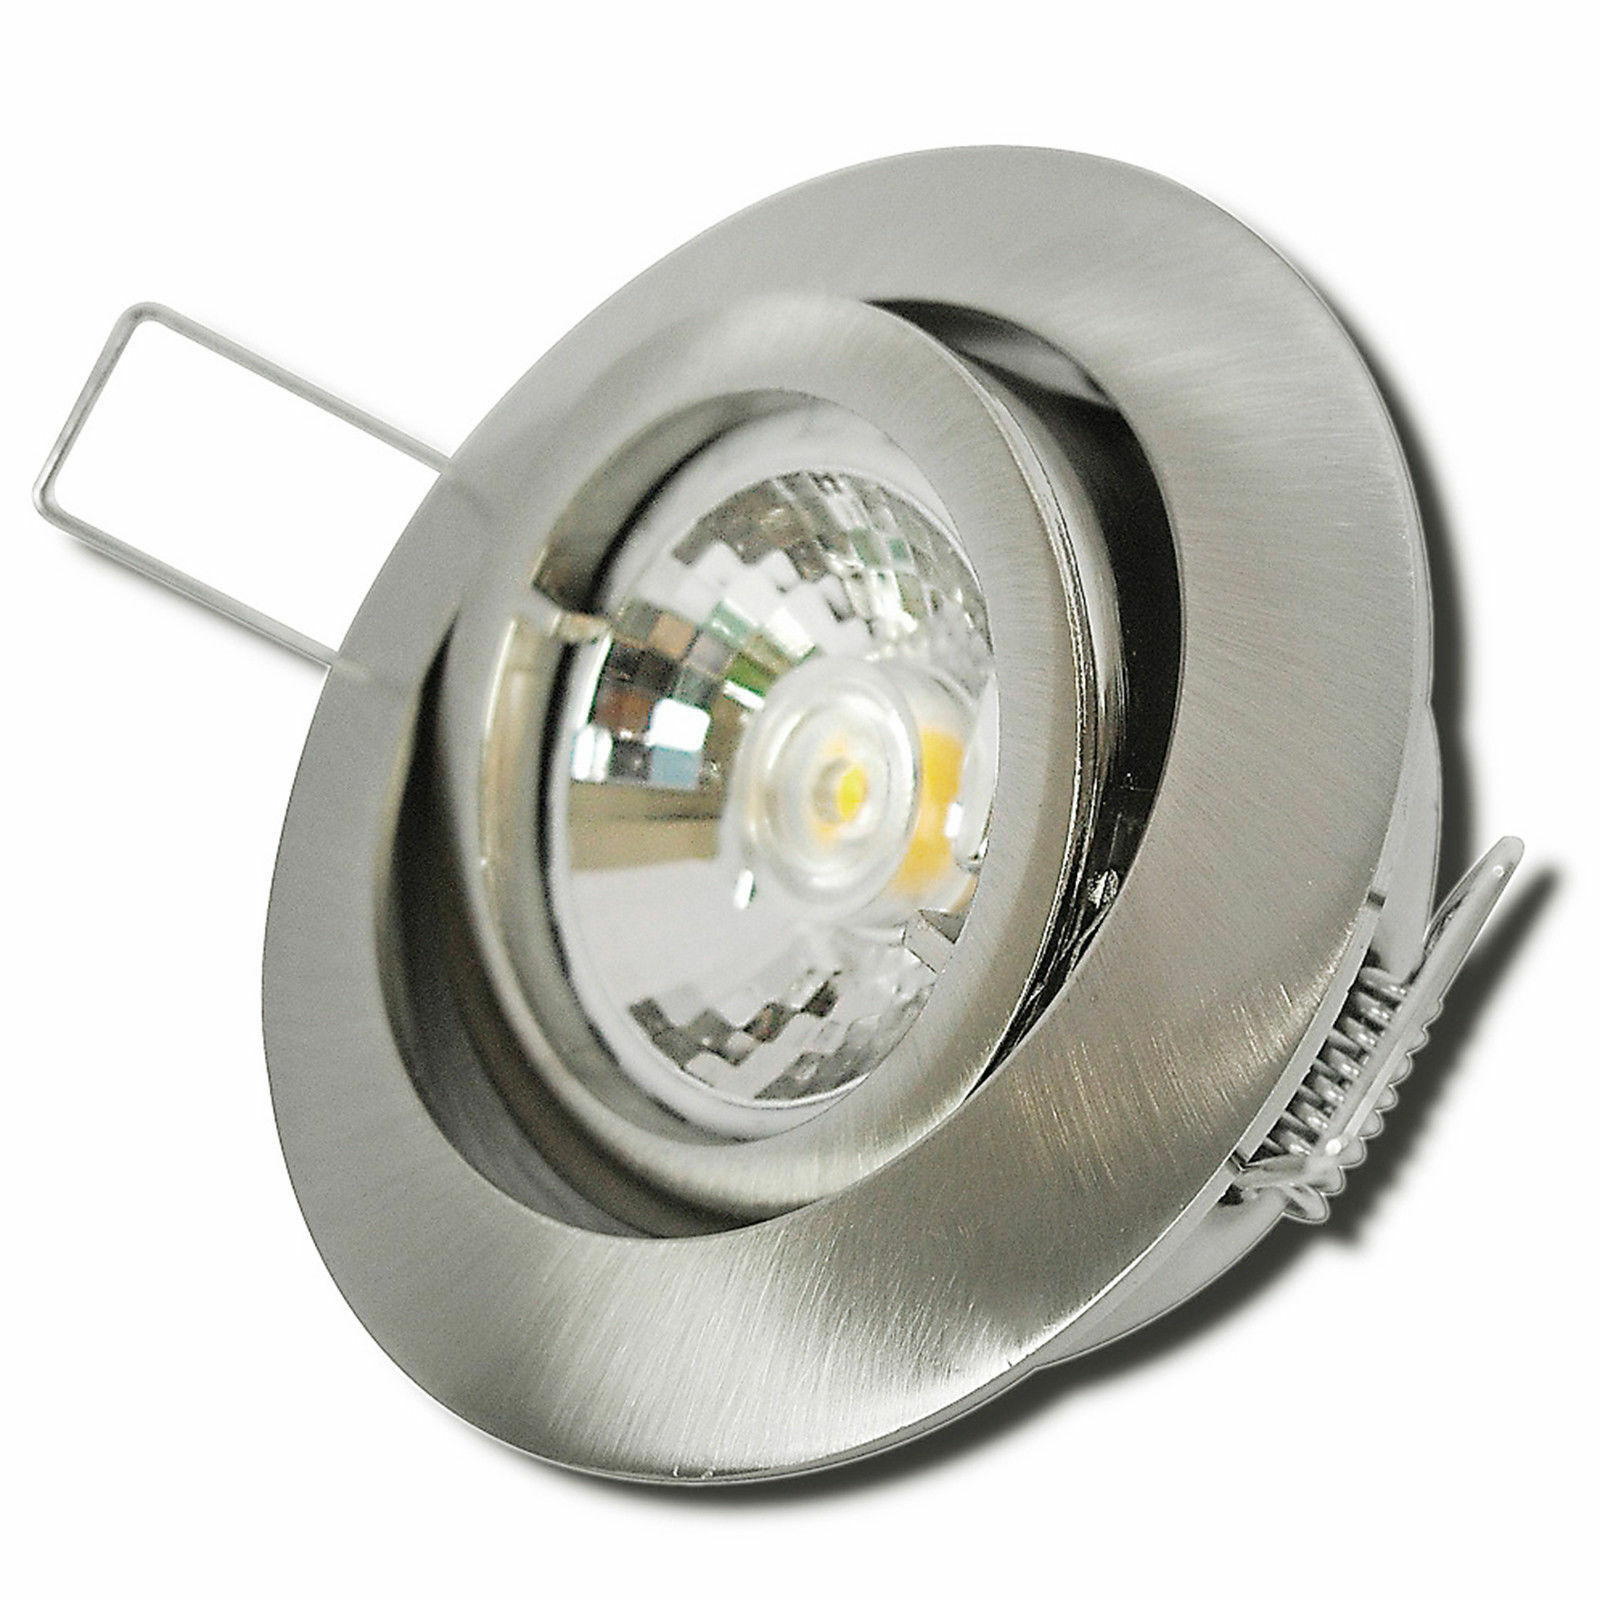 1er- 10er Sets 7W COB Power LED Einbaustrahler Timo   220V   EEK A+   Alu   IP20